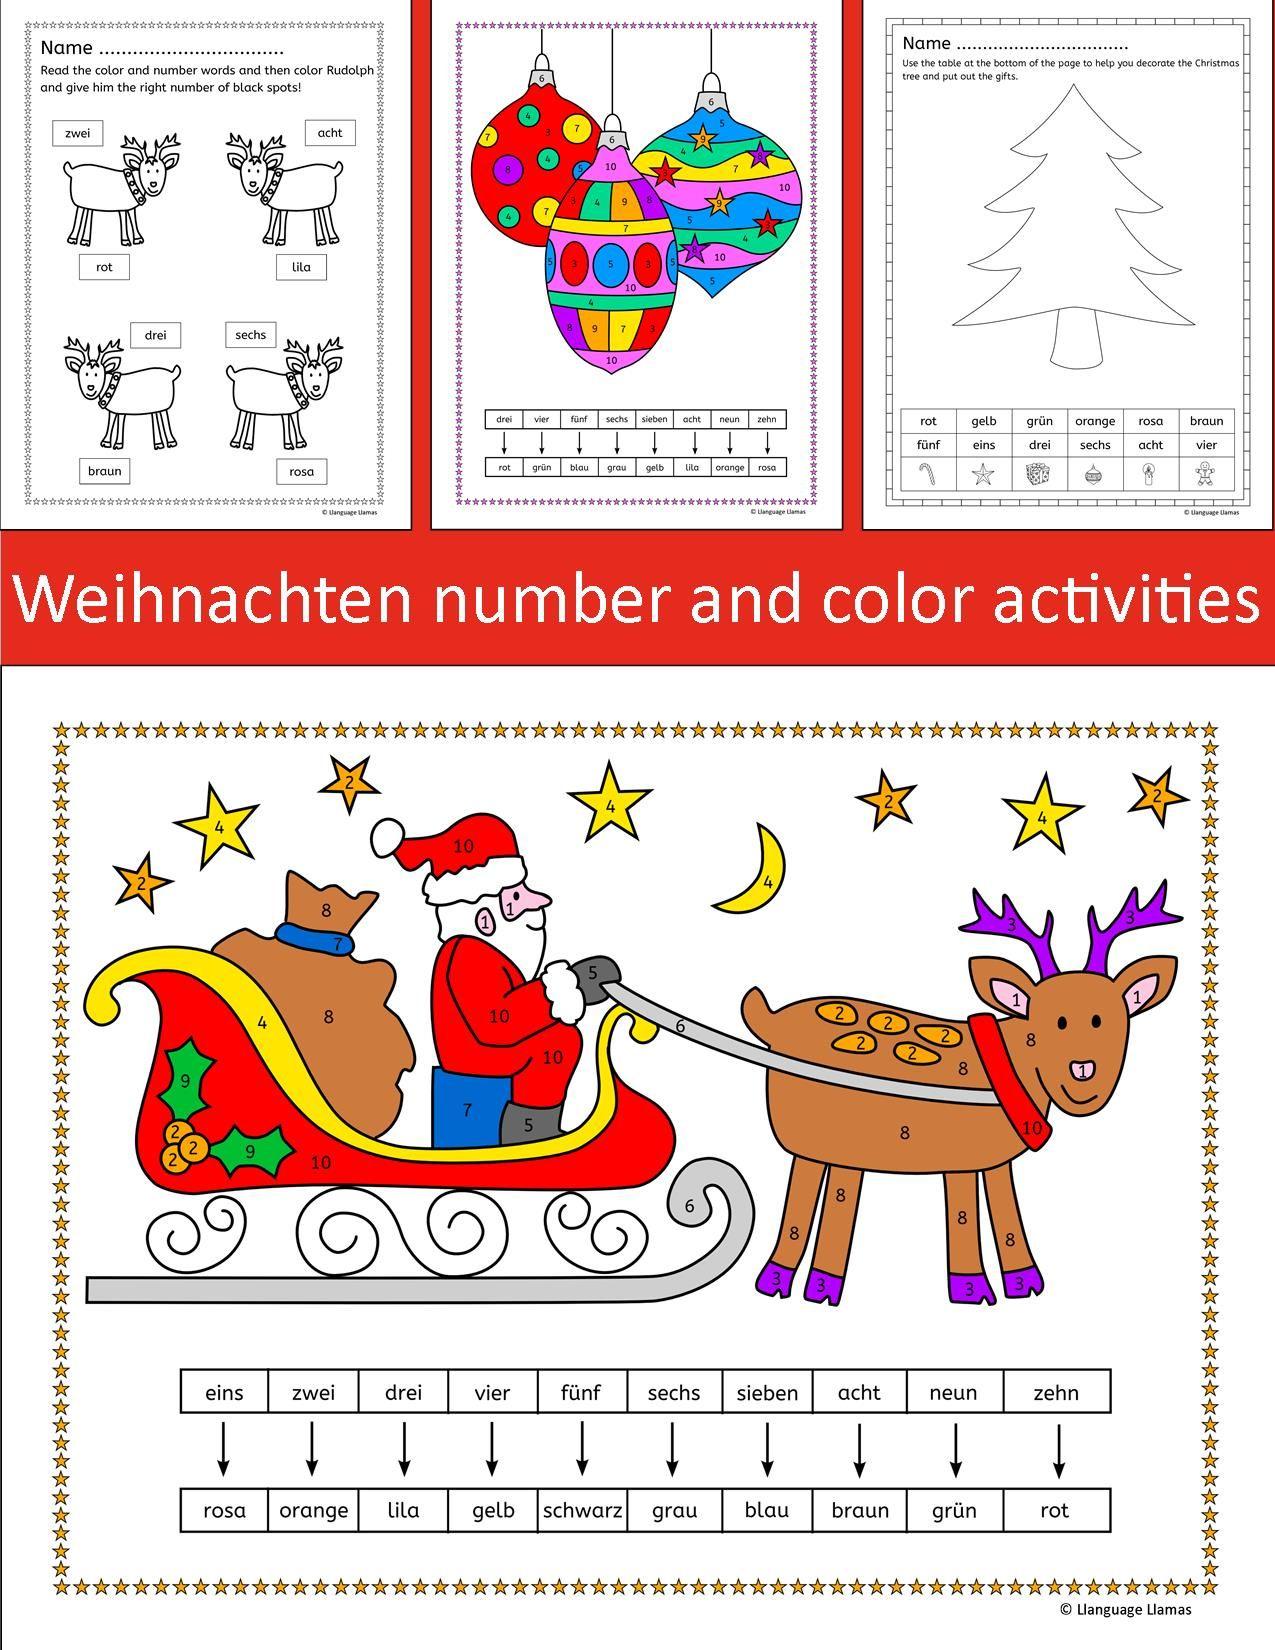 German Christmas Weihnachten Number And Color Activities